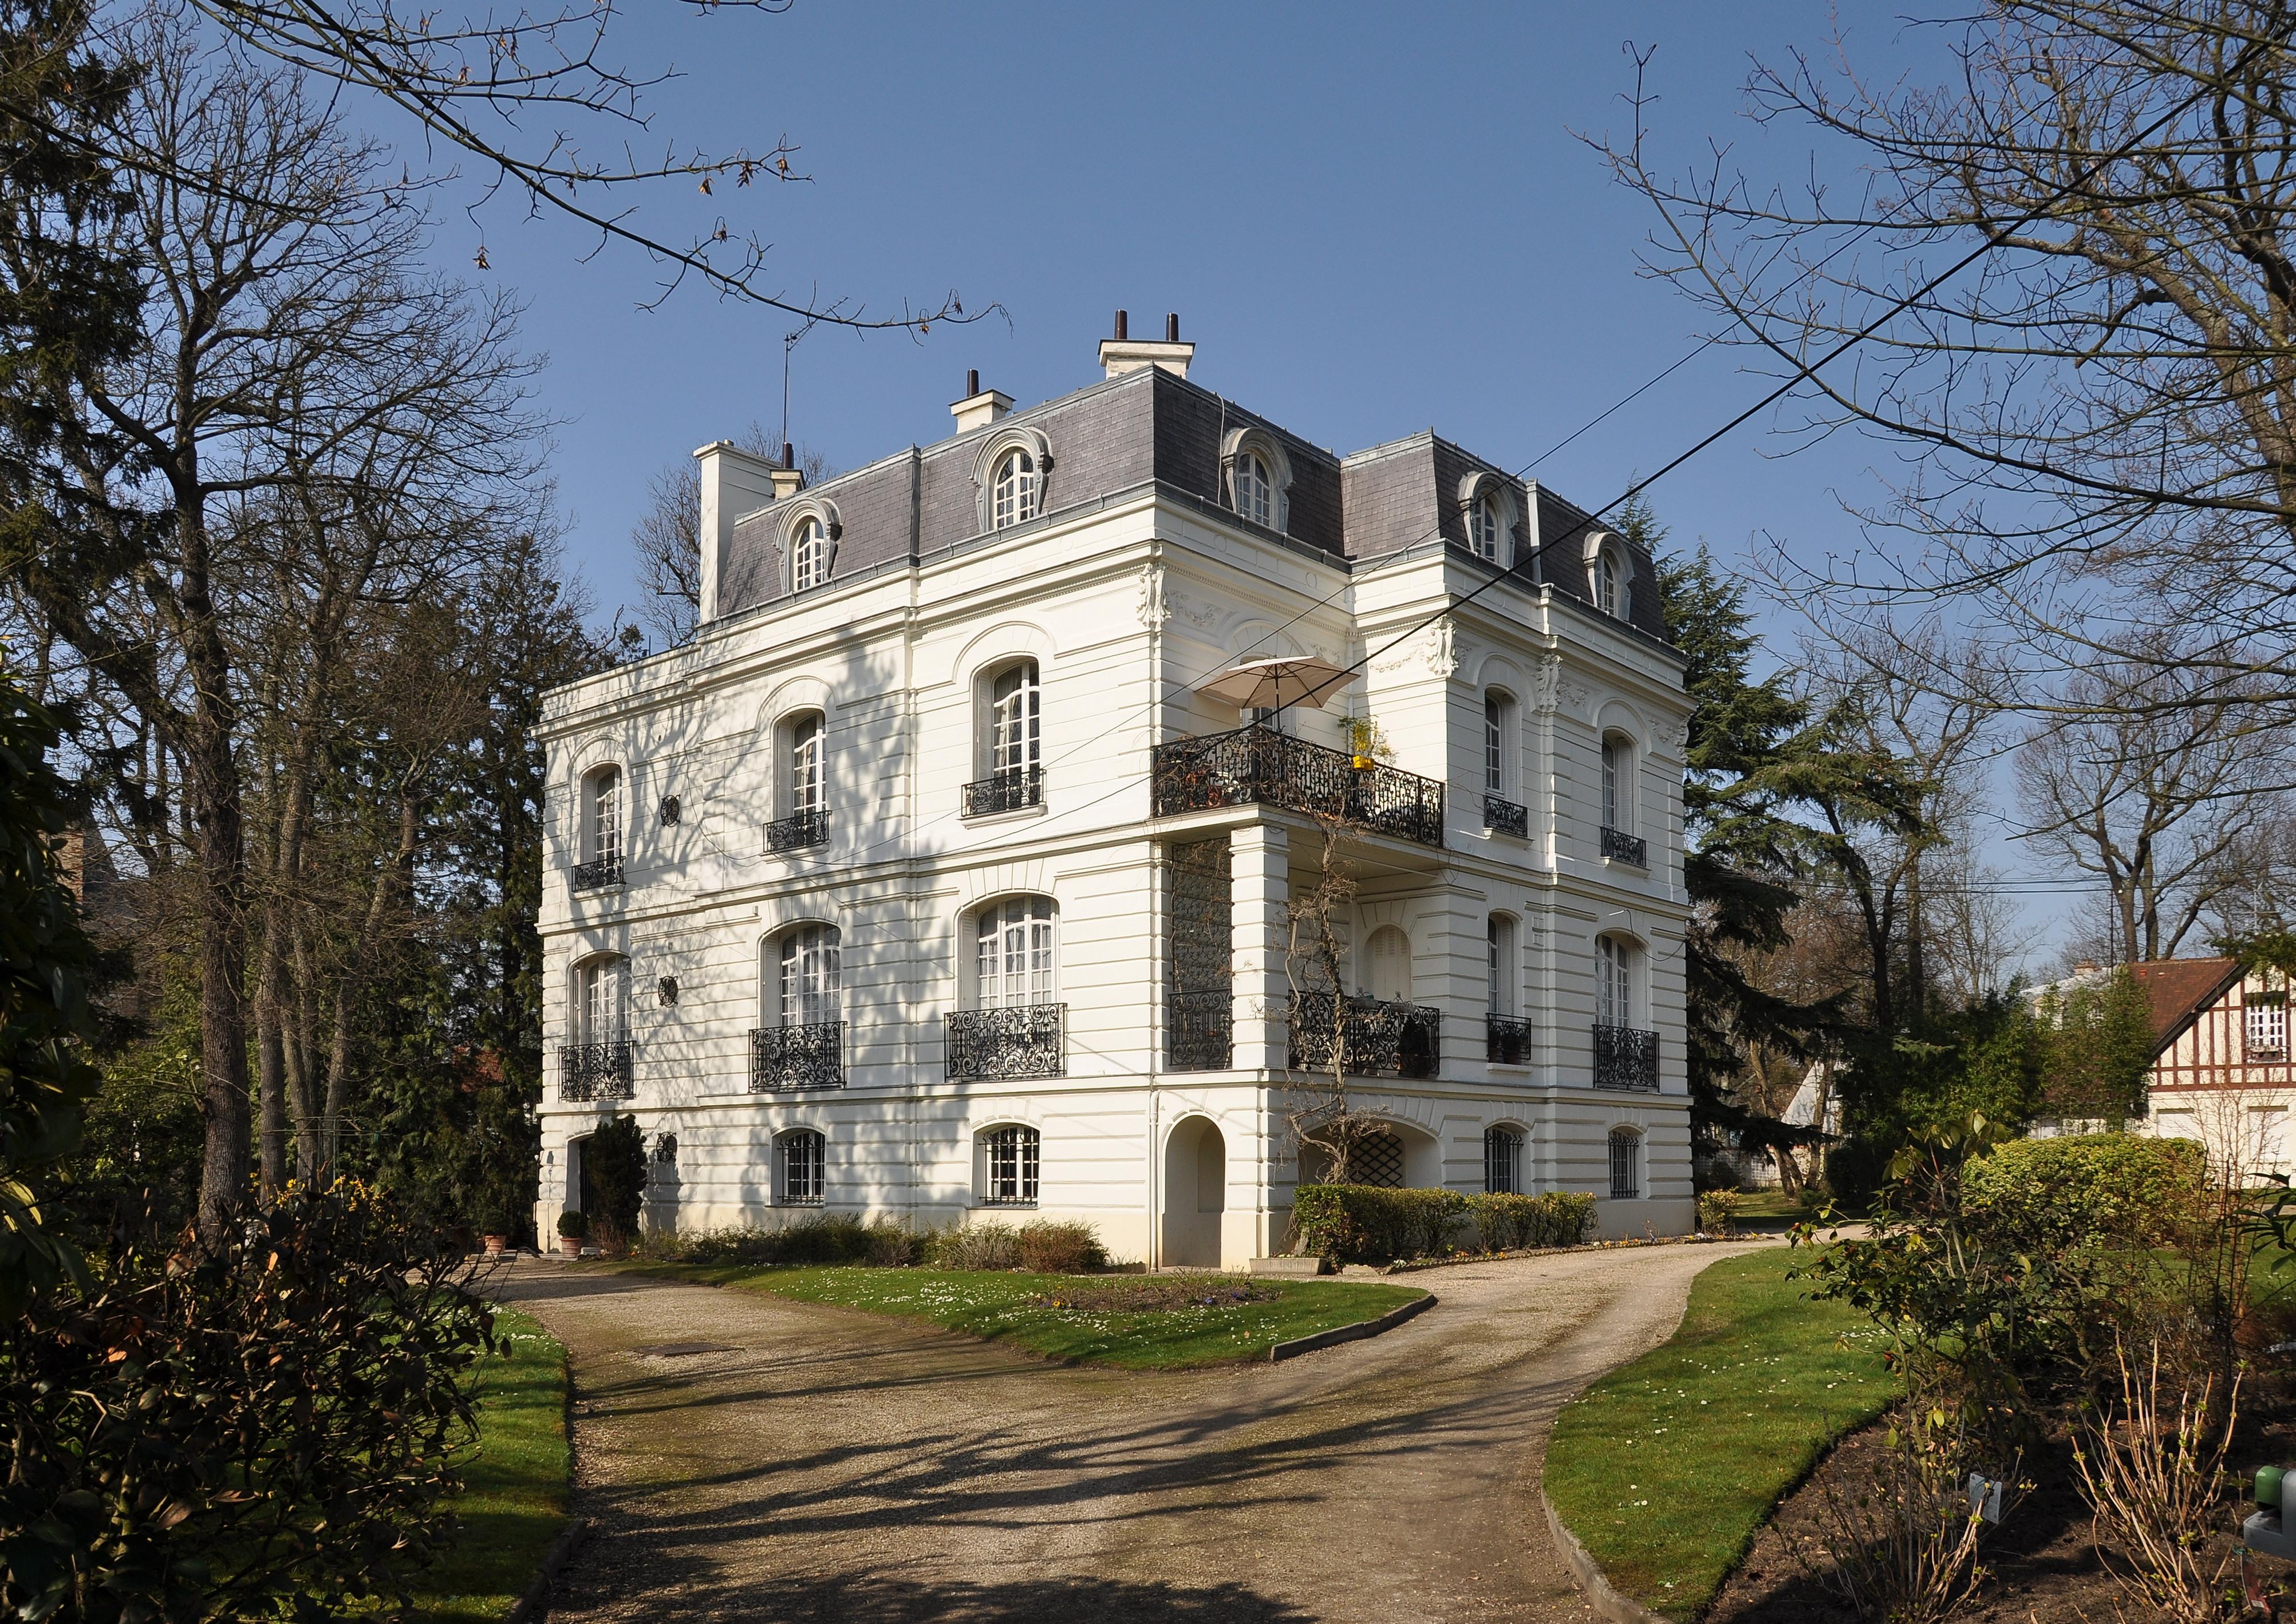 Location De Villa En Ville France